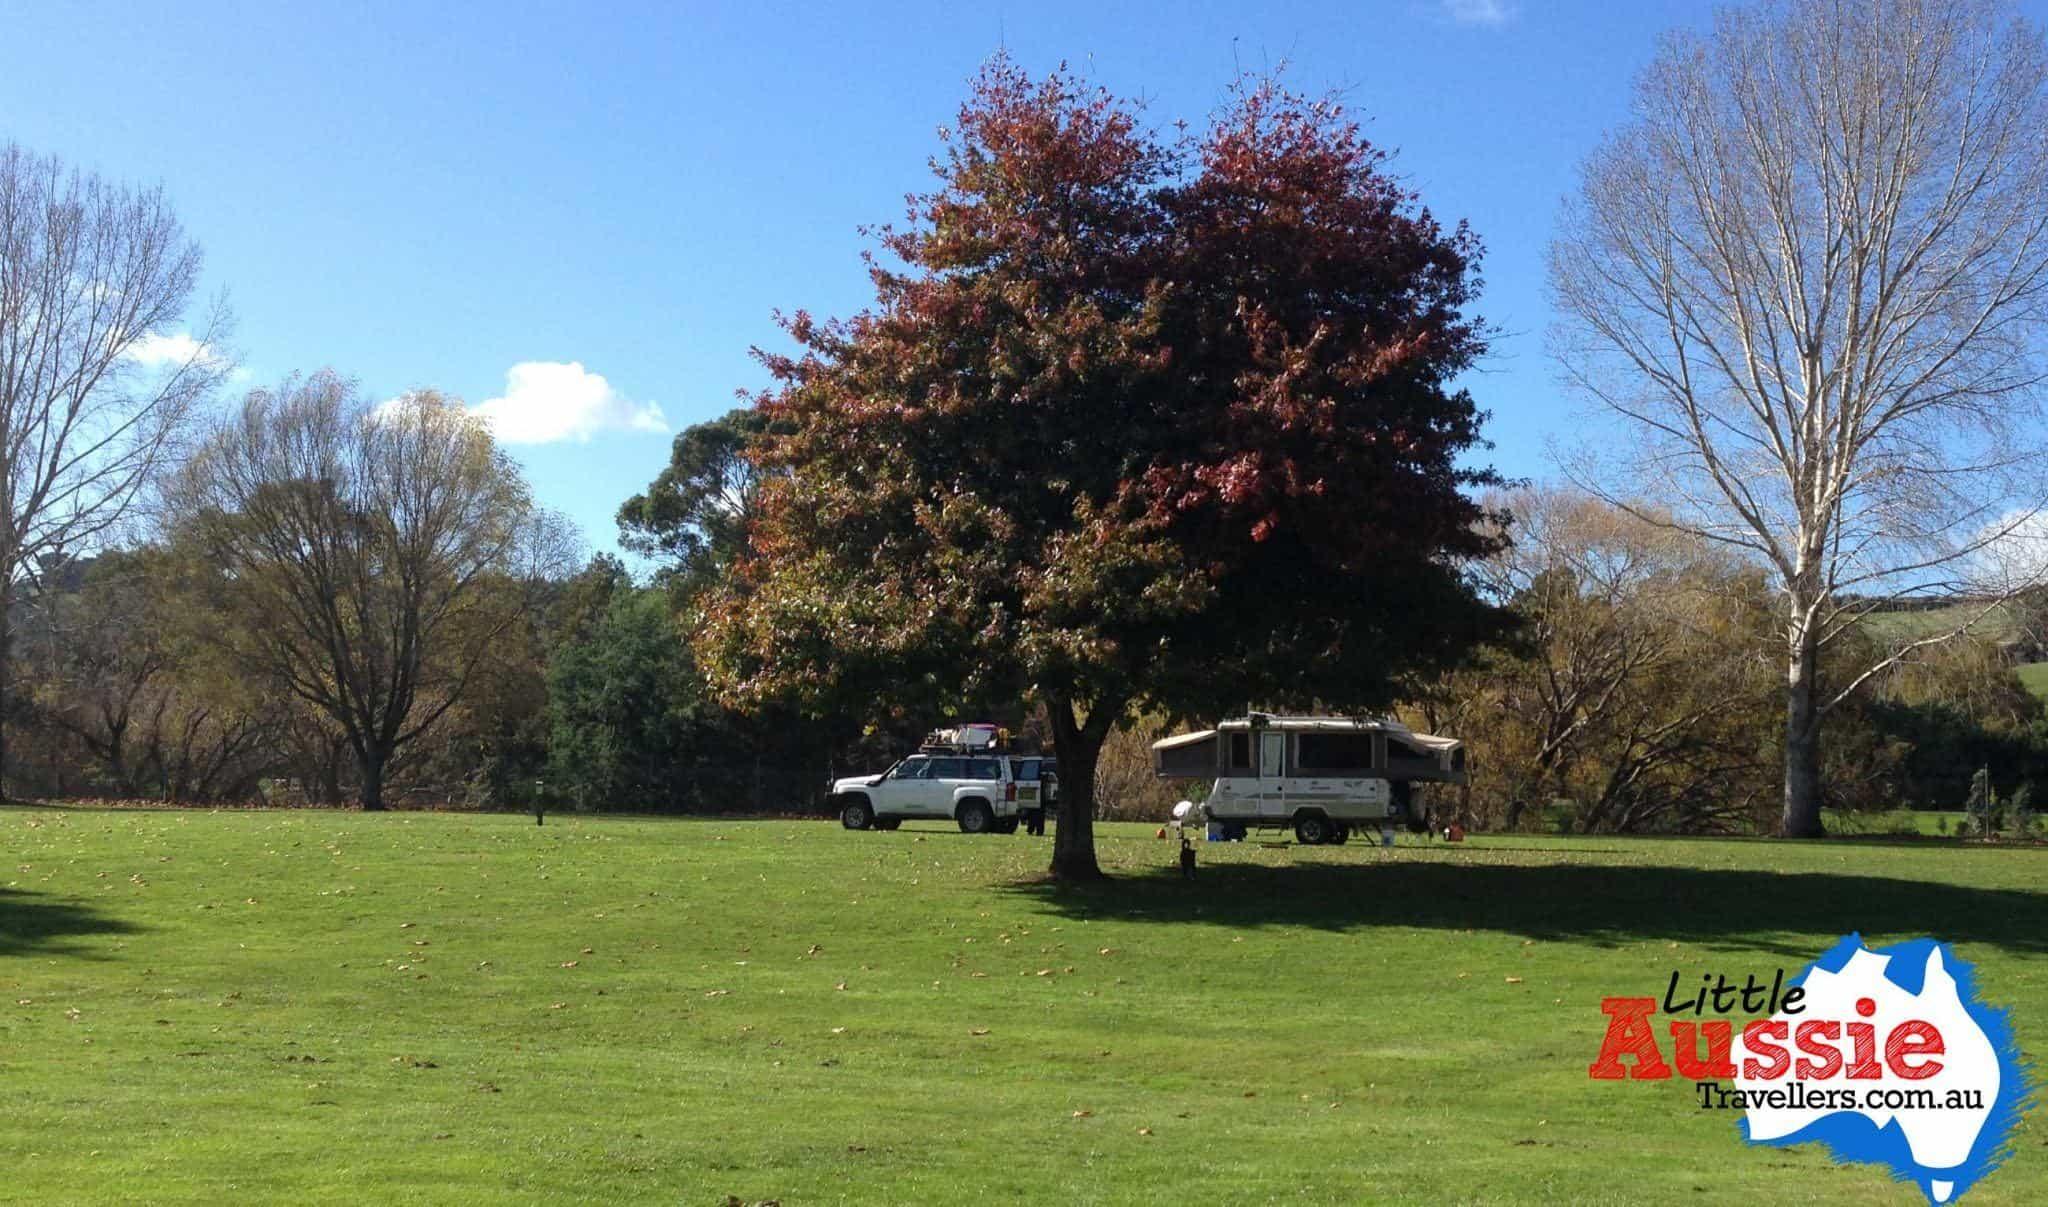 Free Camping Tasmania